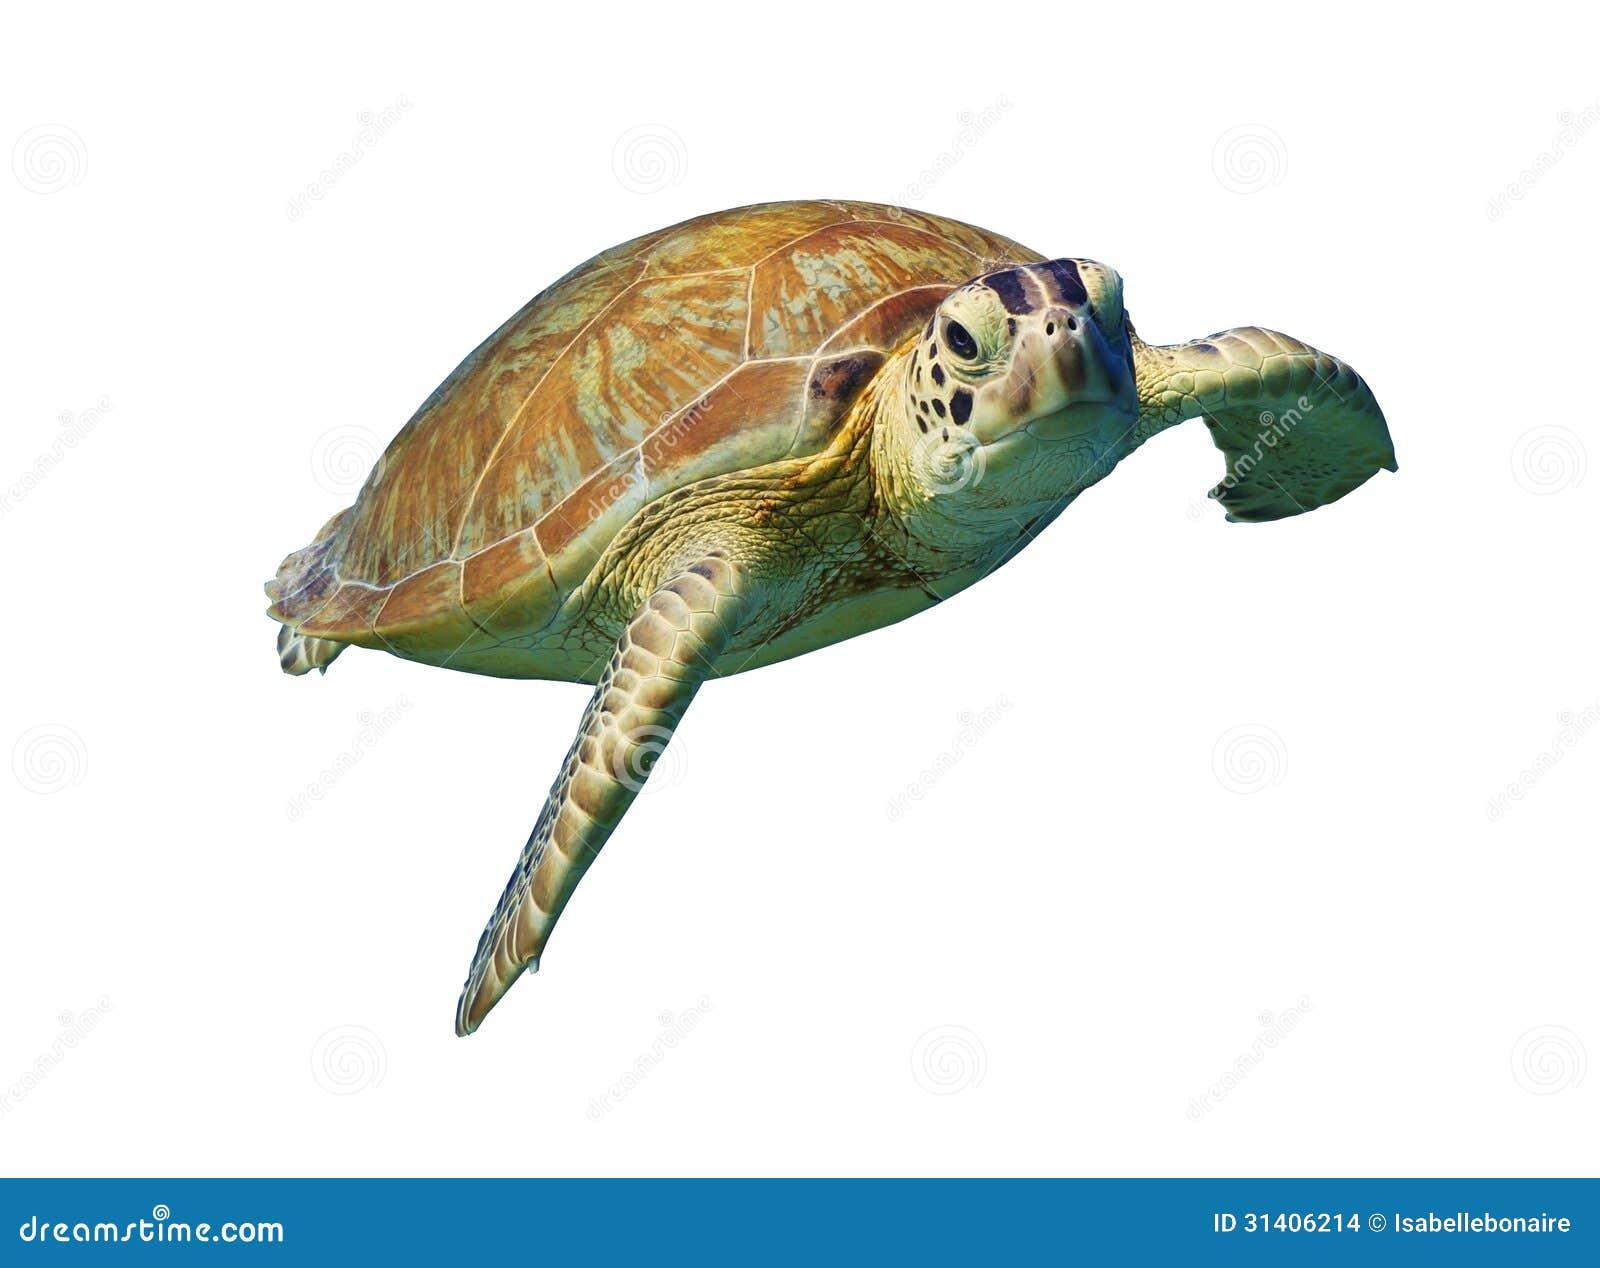 turtle white background - photo #40